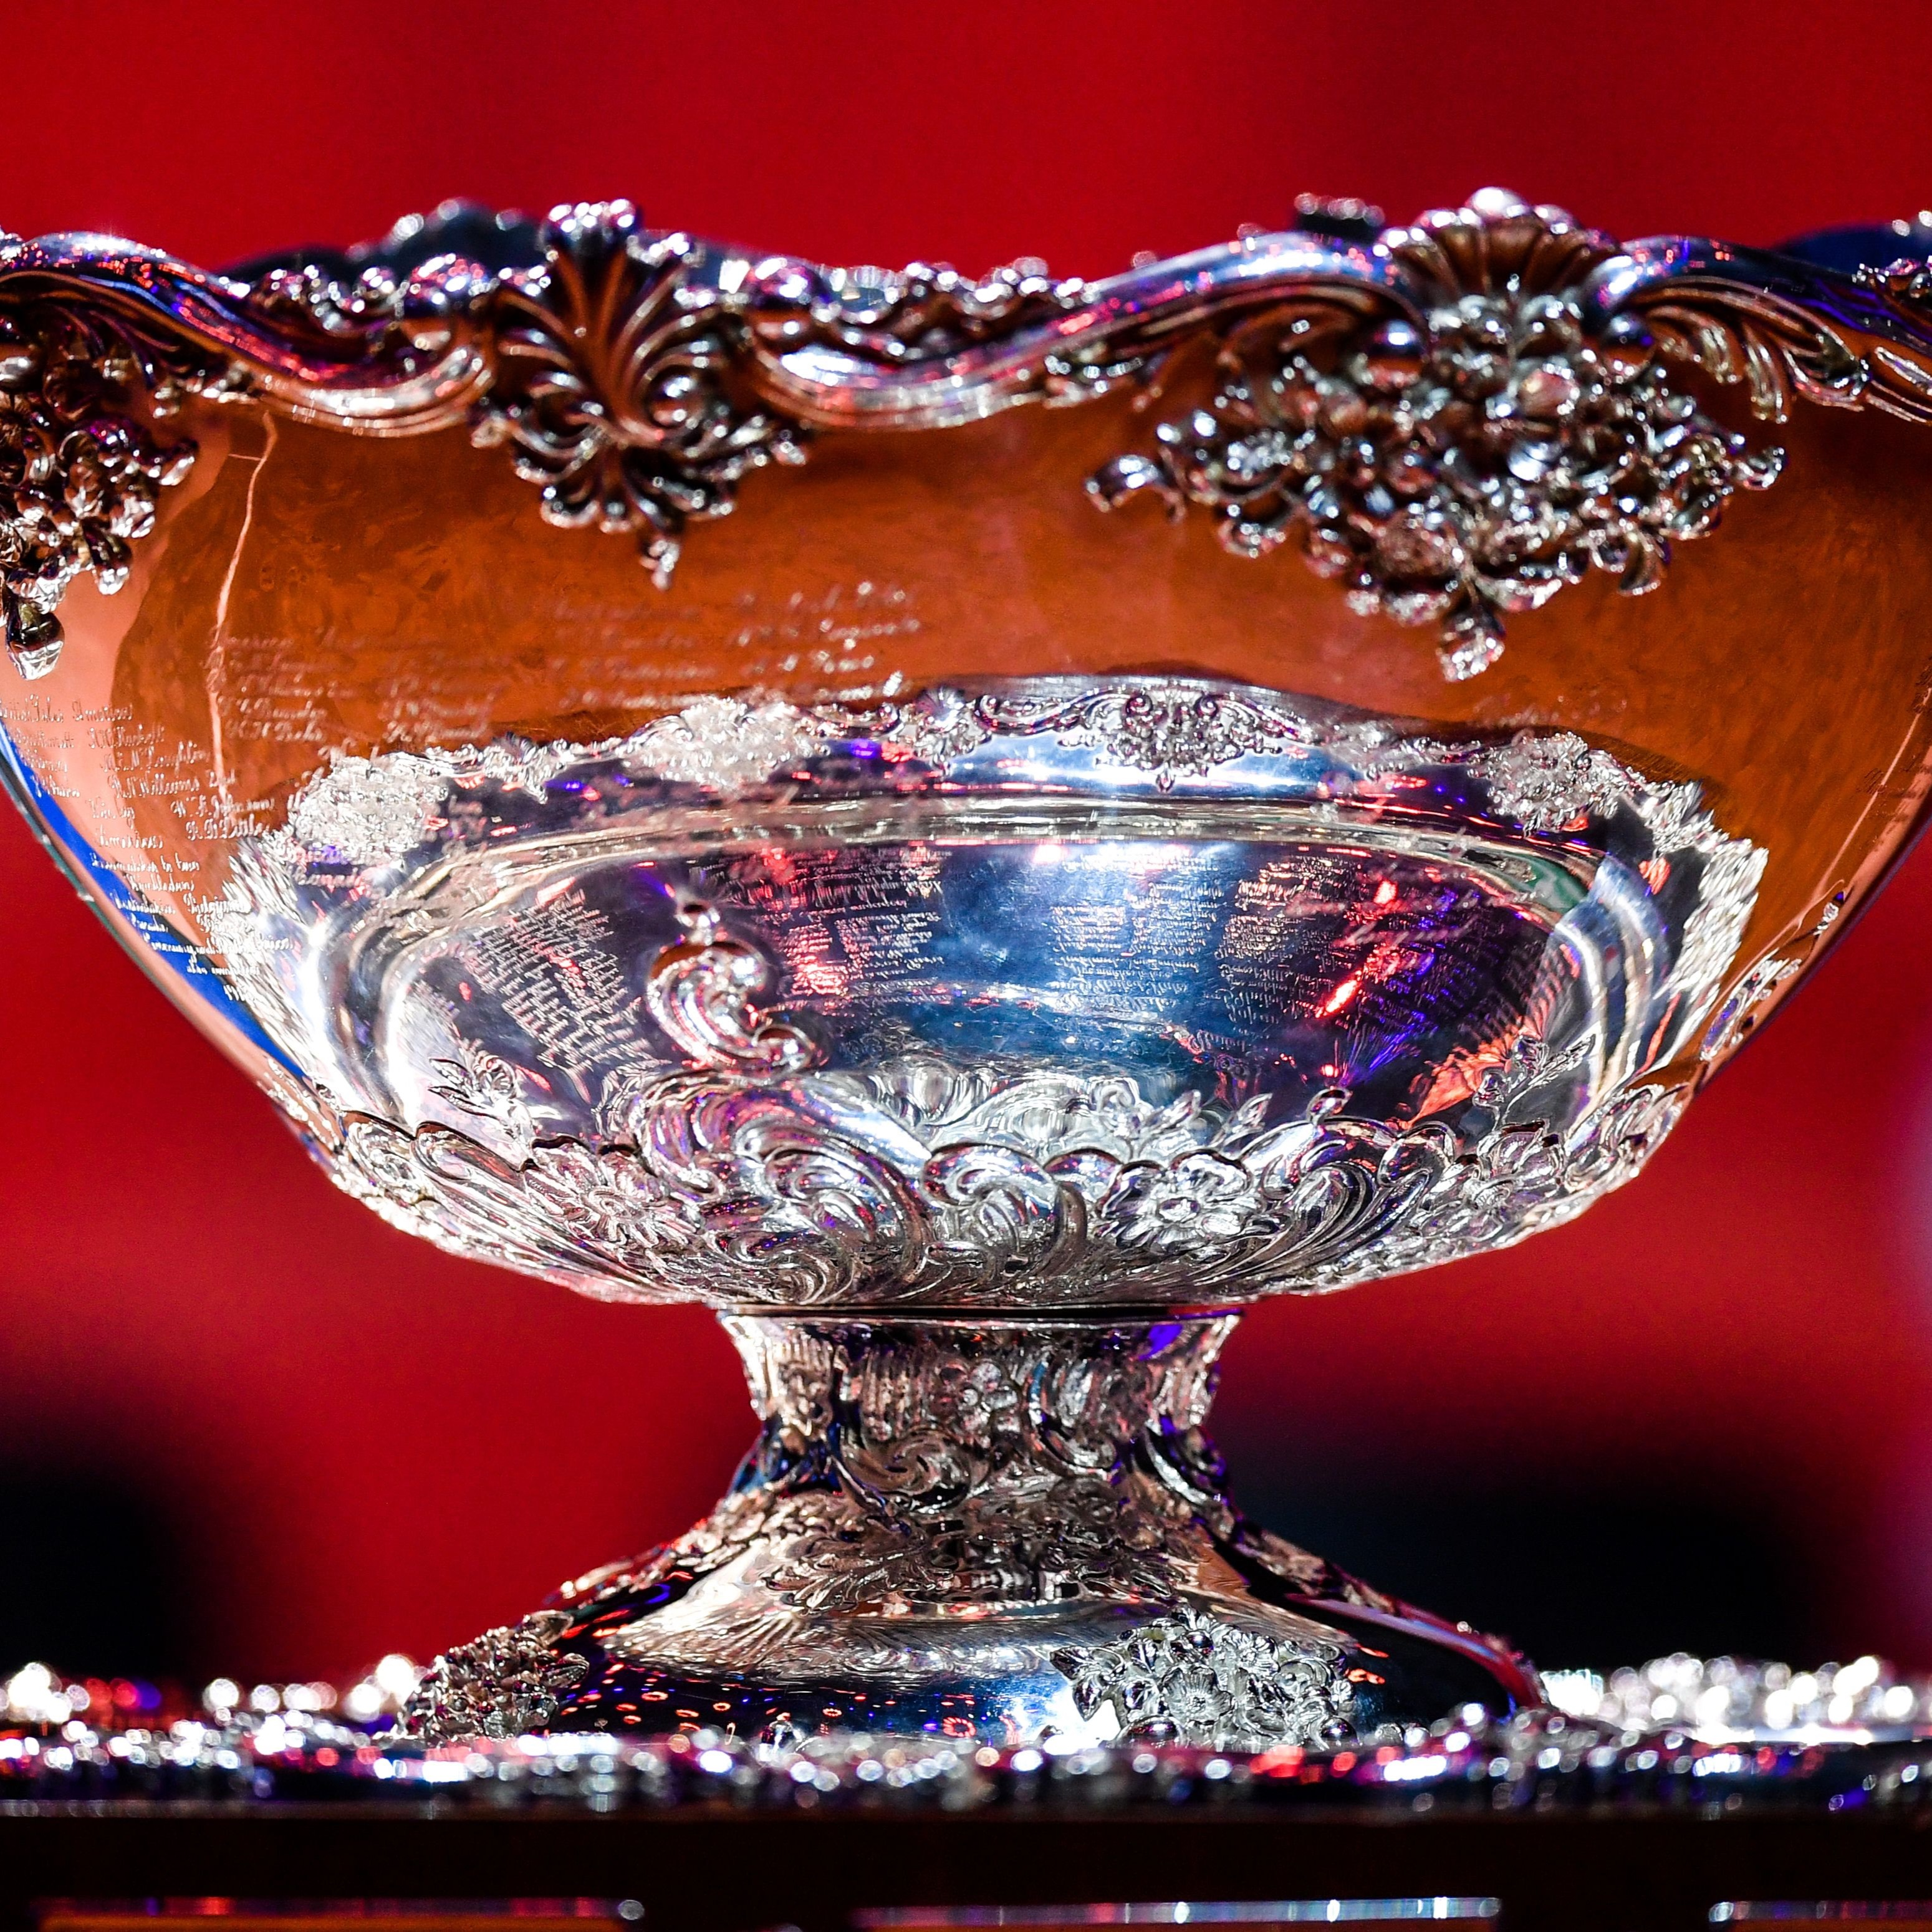 Nord-Süd-Gipfel – Ausgabe 16 – Quo vadis, Davis Cup?